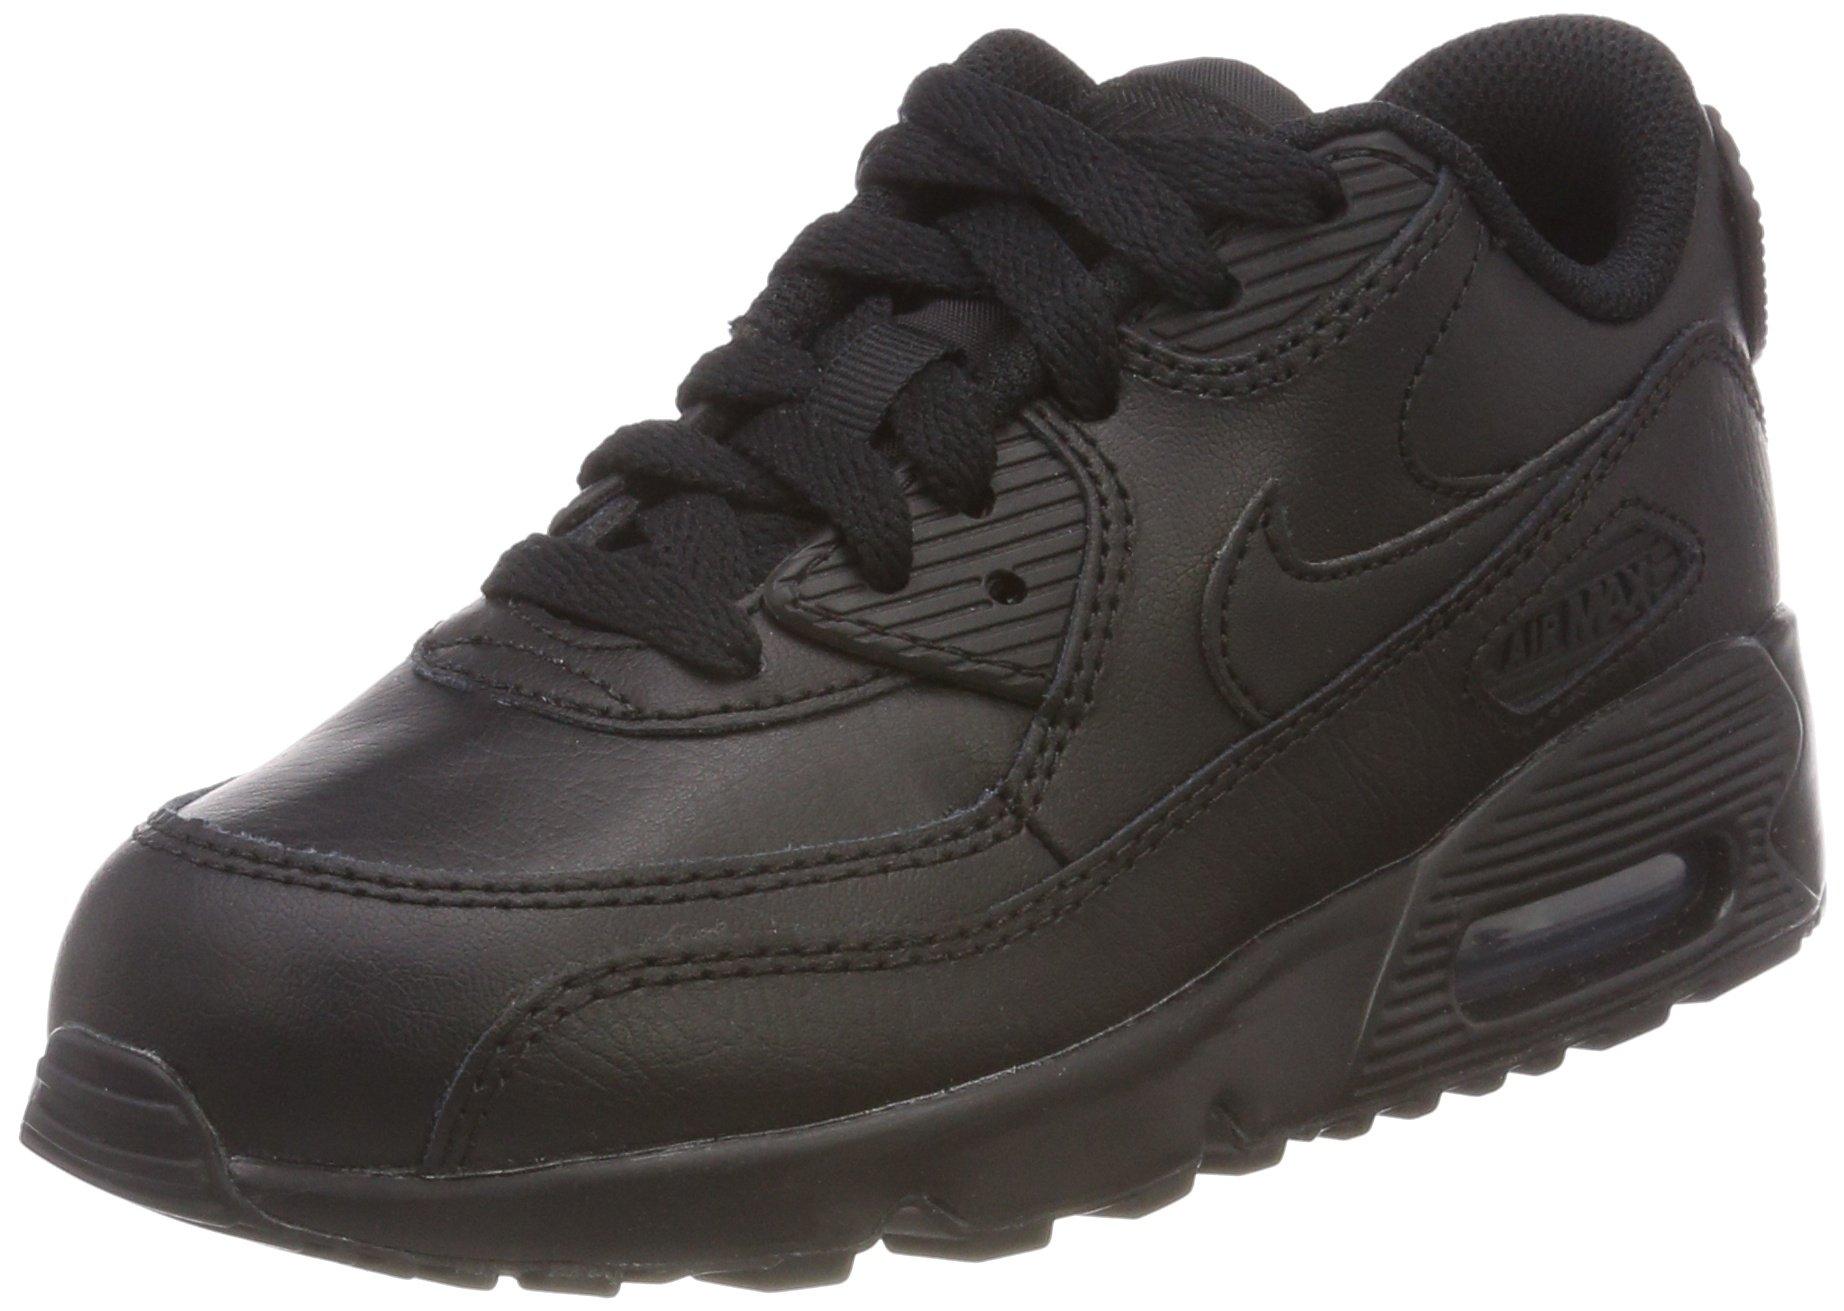 Nike Air Max 90 LTR Black/Black (Little Kid) (2.5 Little Kid M)